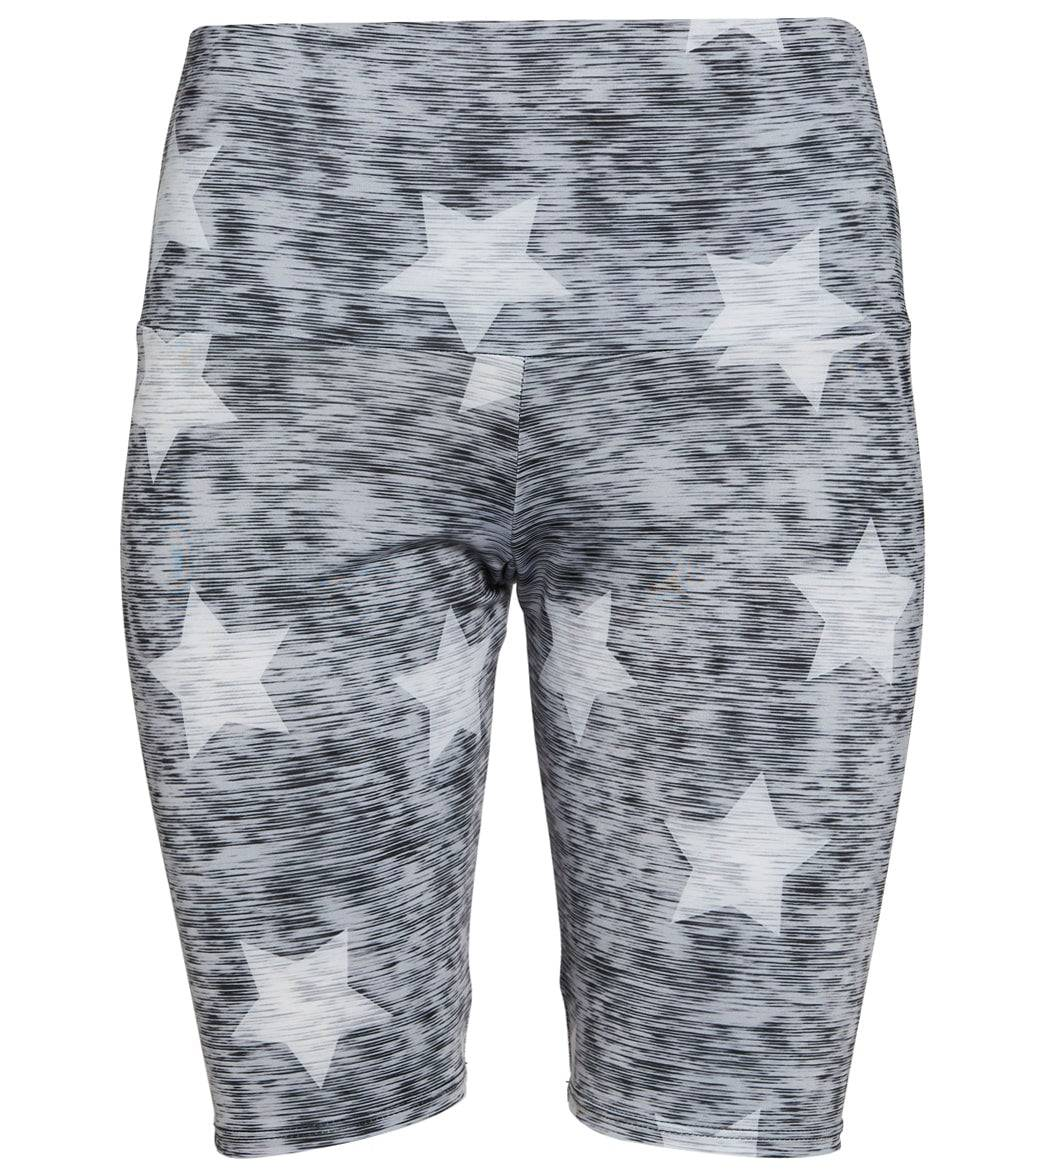 Onzie Women's High Rise Bike Shorts - Heathered Star - ML Spandex